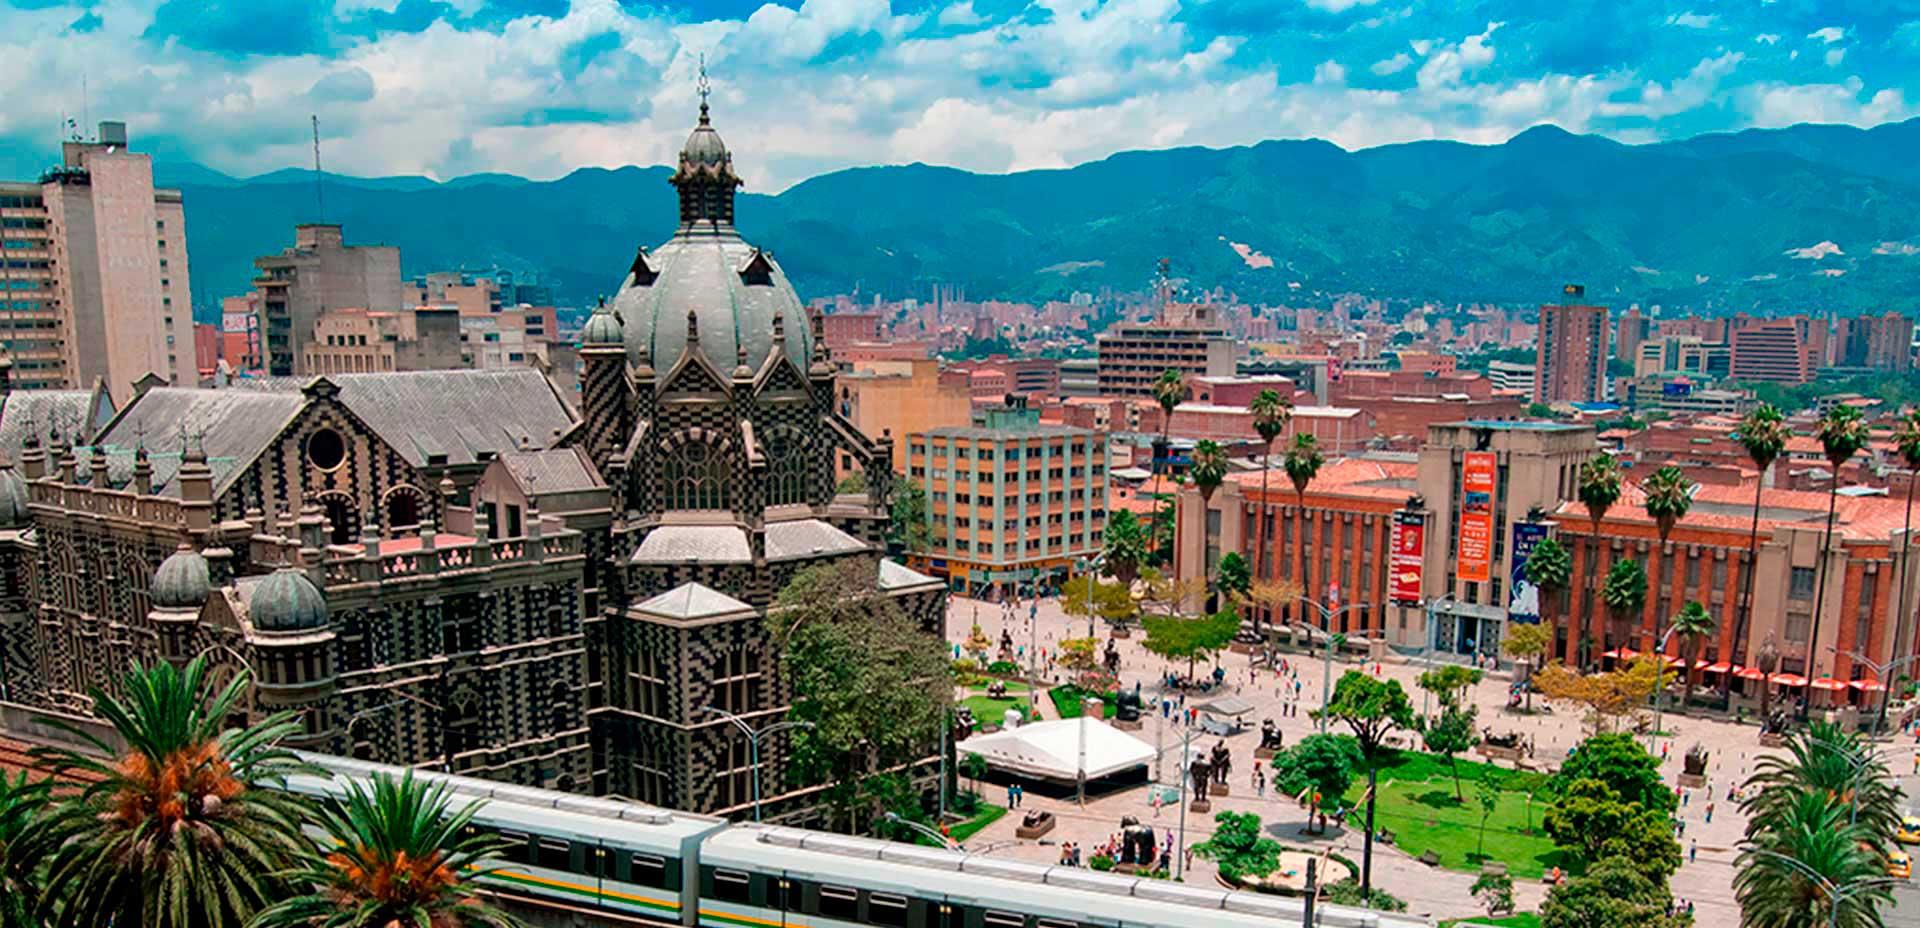 Medellín/ Crédito foto: http://www.dubbi.com.br/destinos/colombia/antioquia/medellin